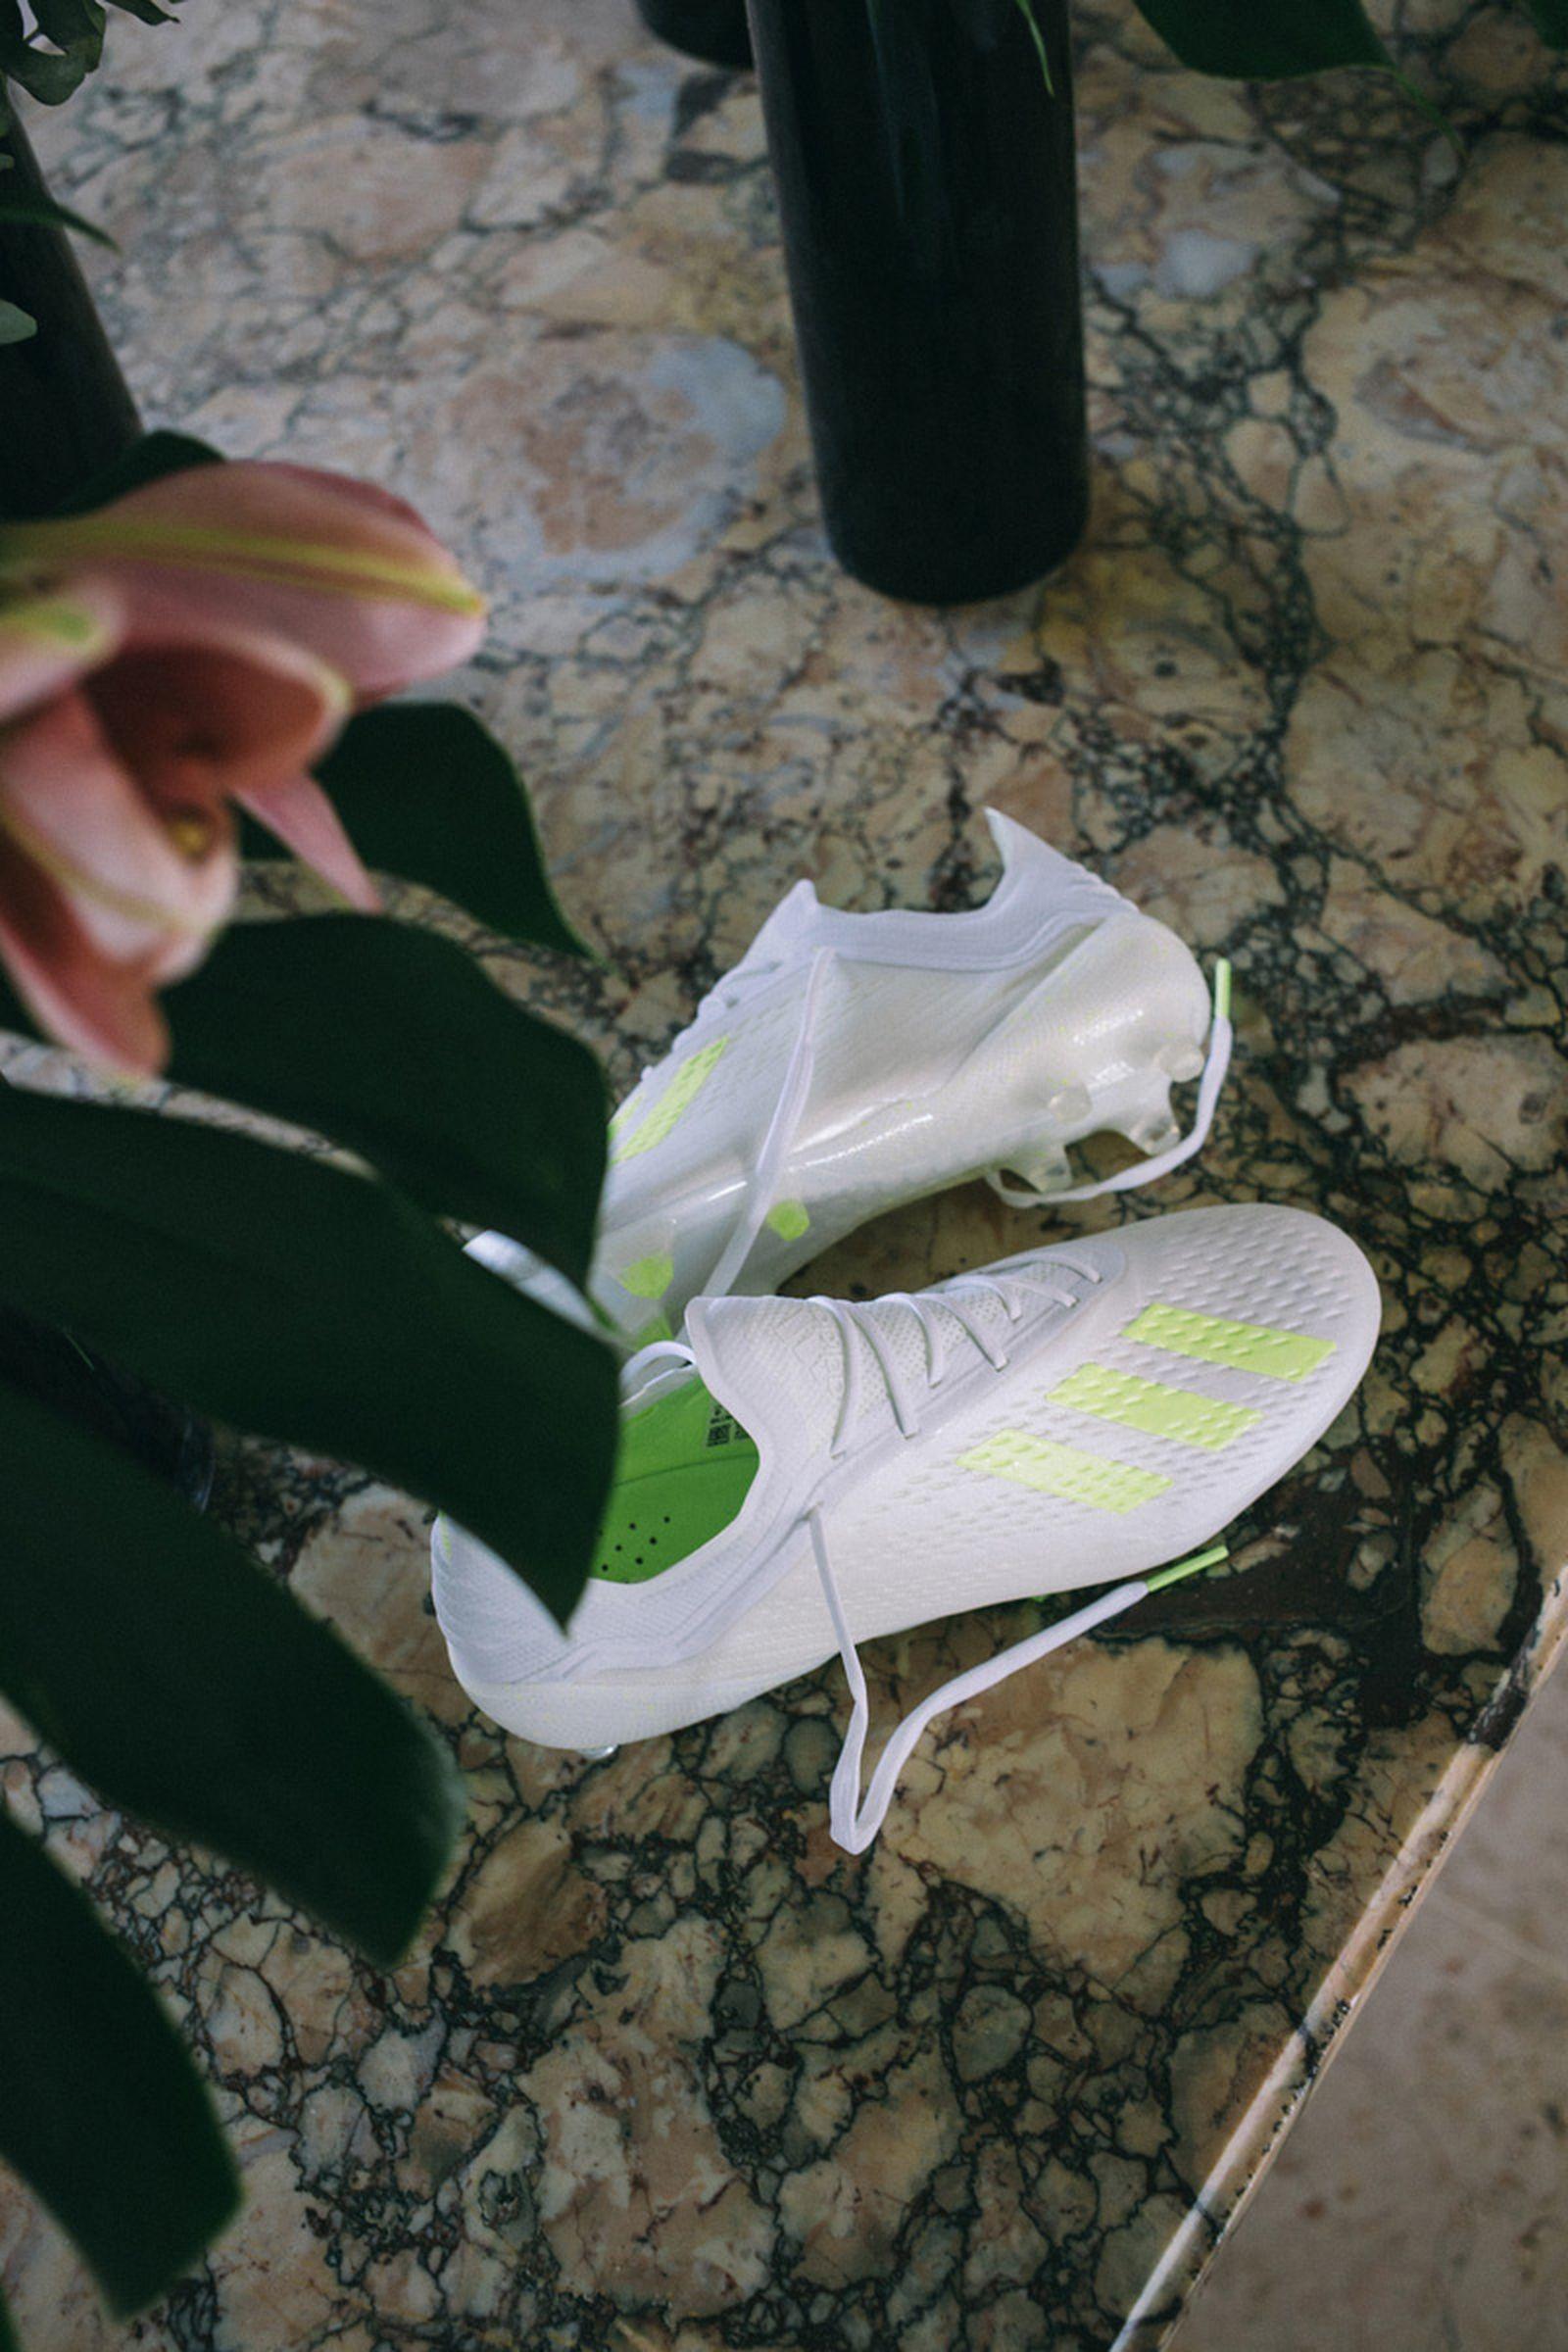 adidas-football-kimpembe-interview-09